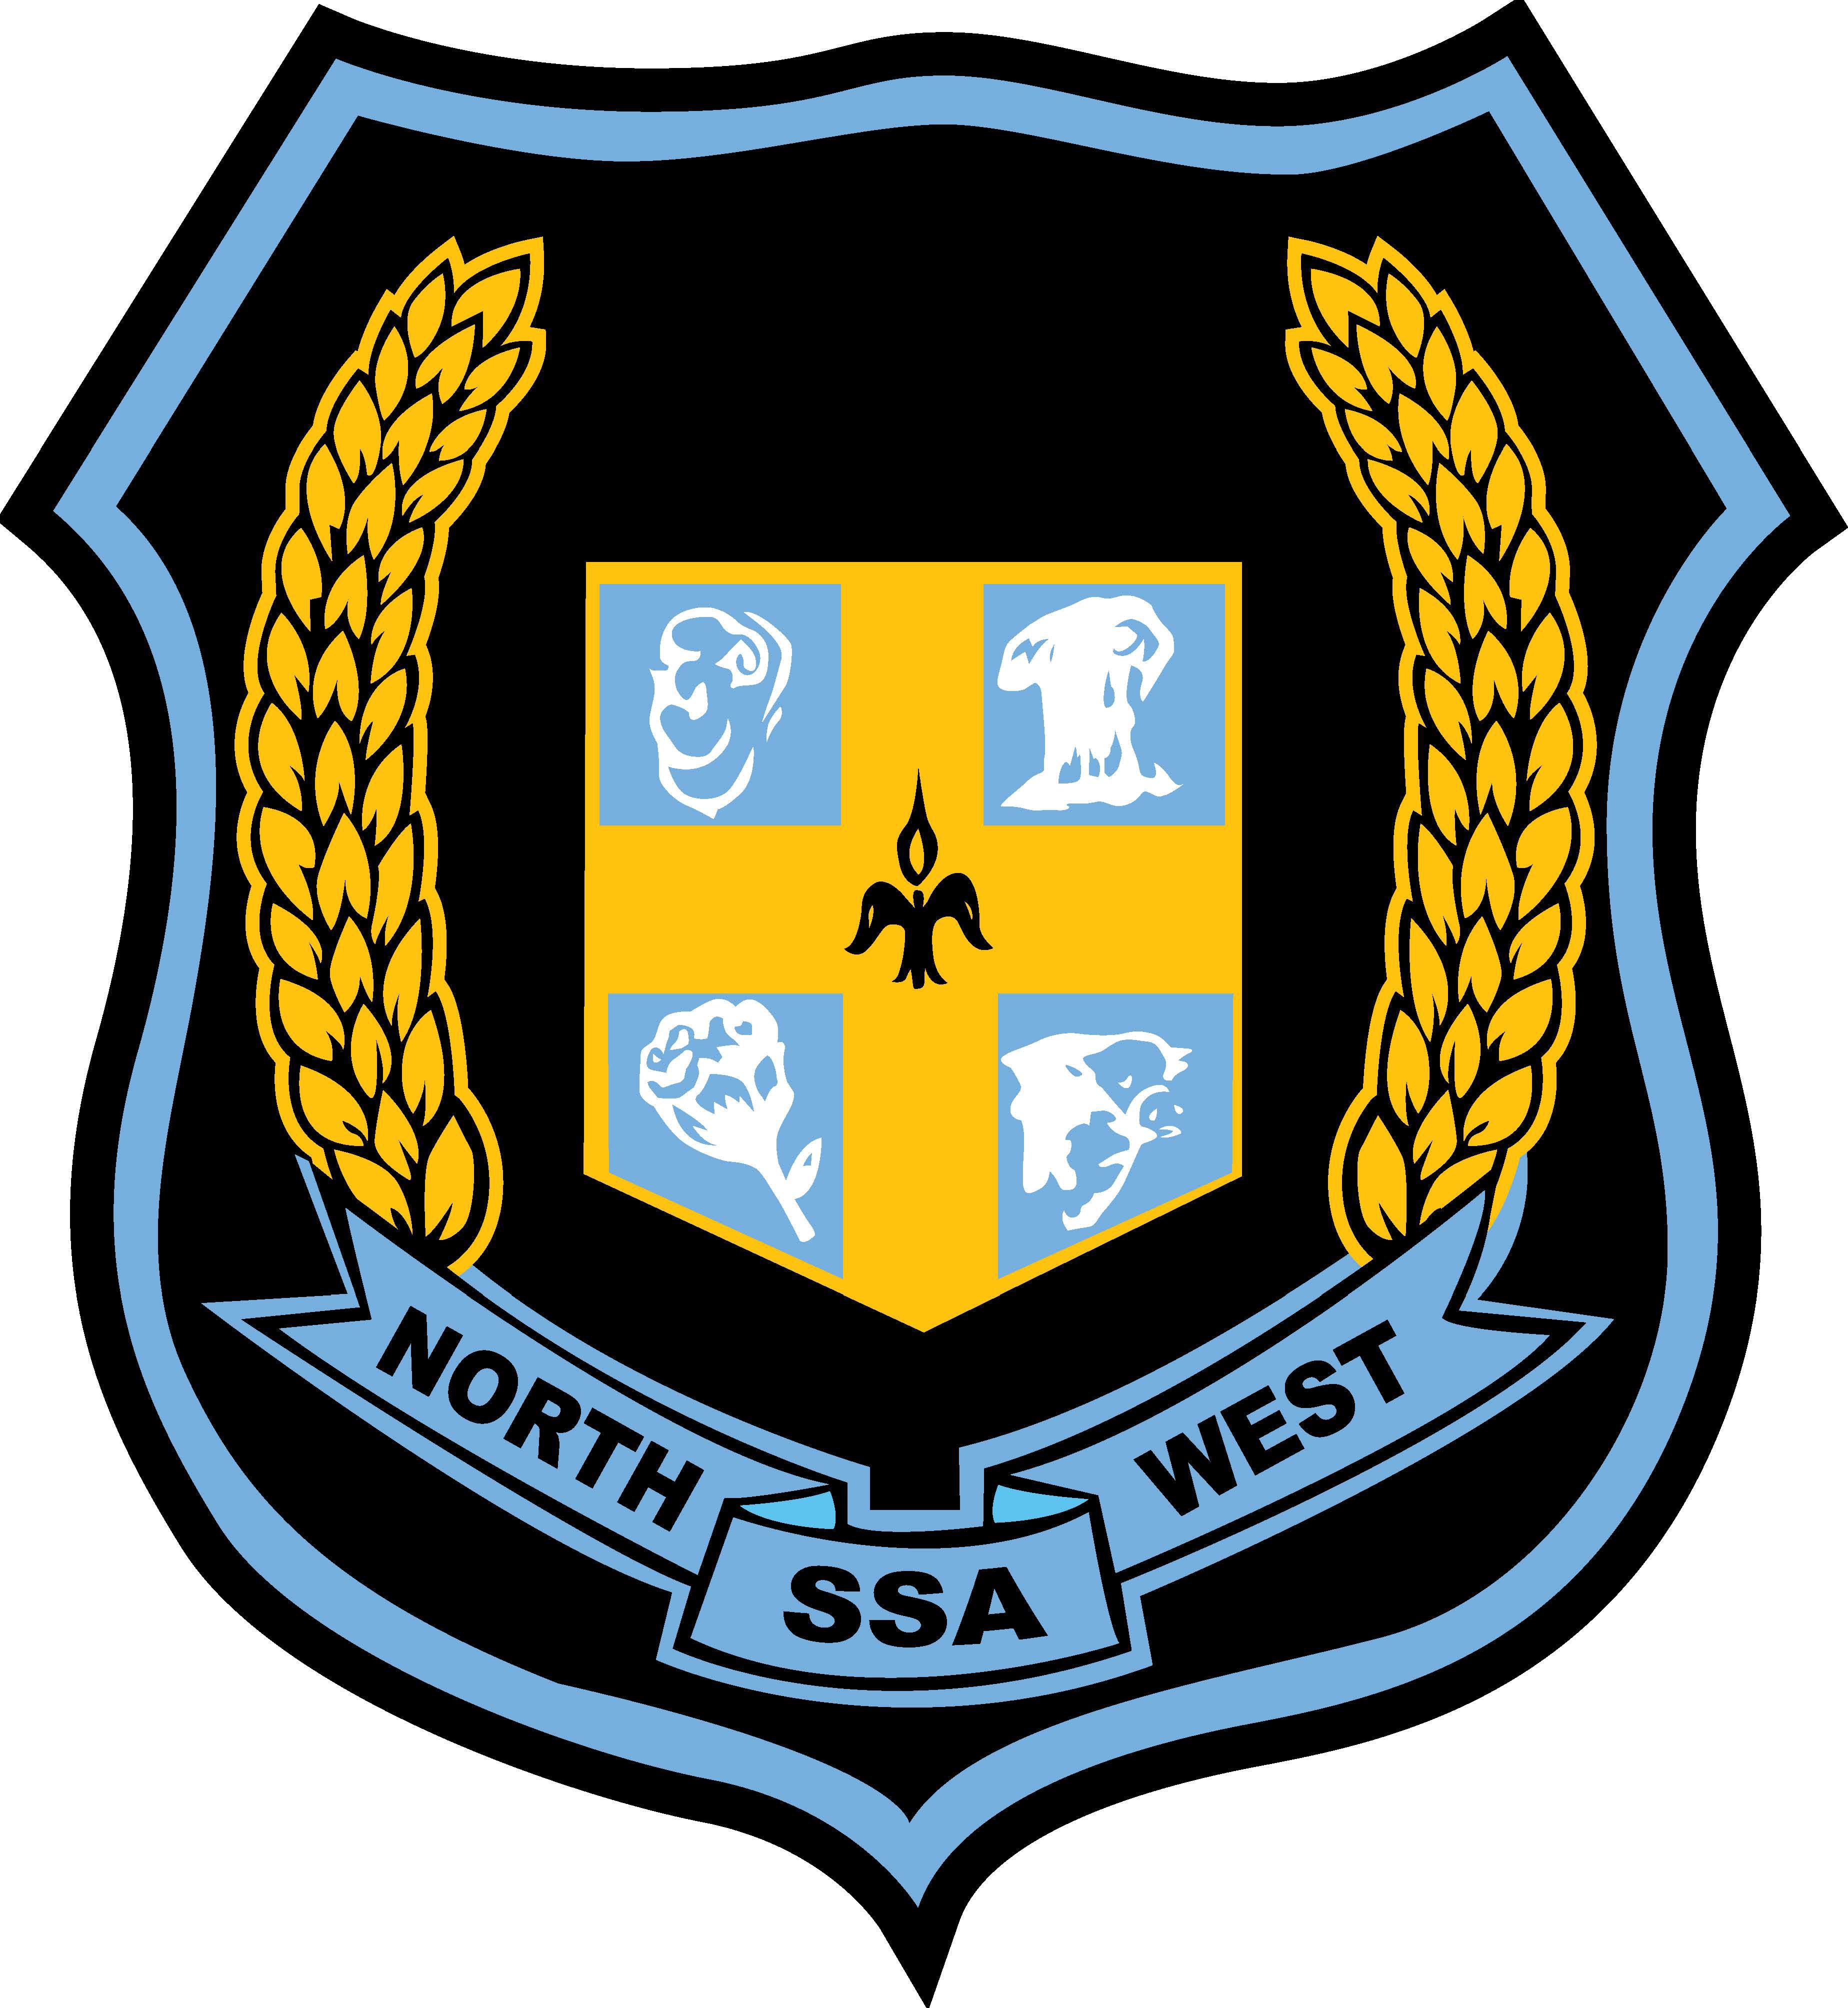 North West Schools Sports Association logo